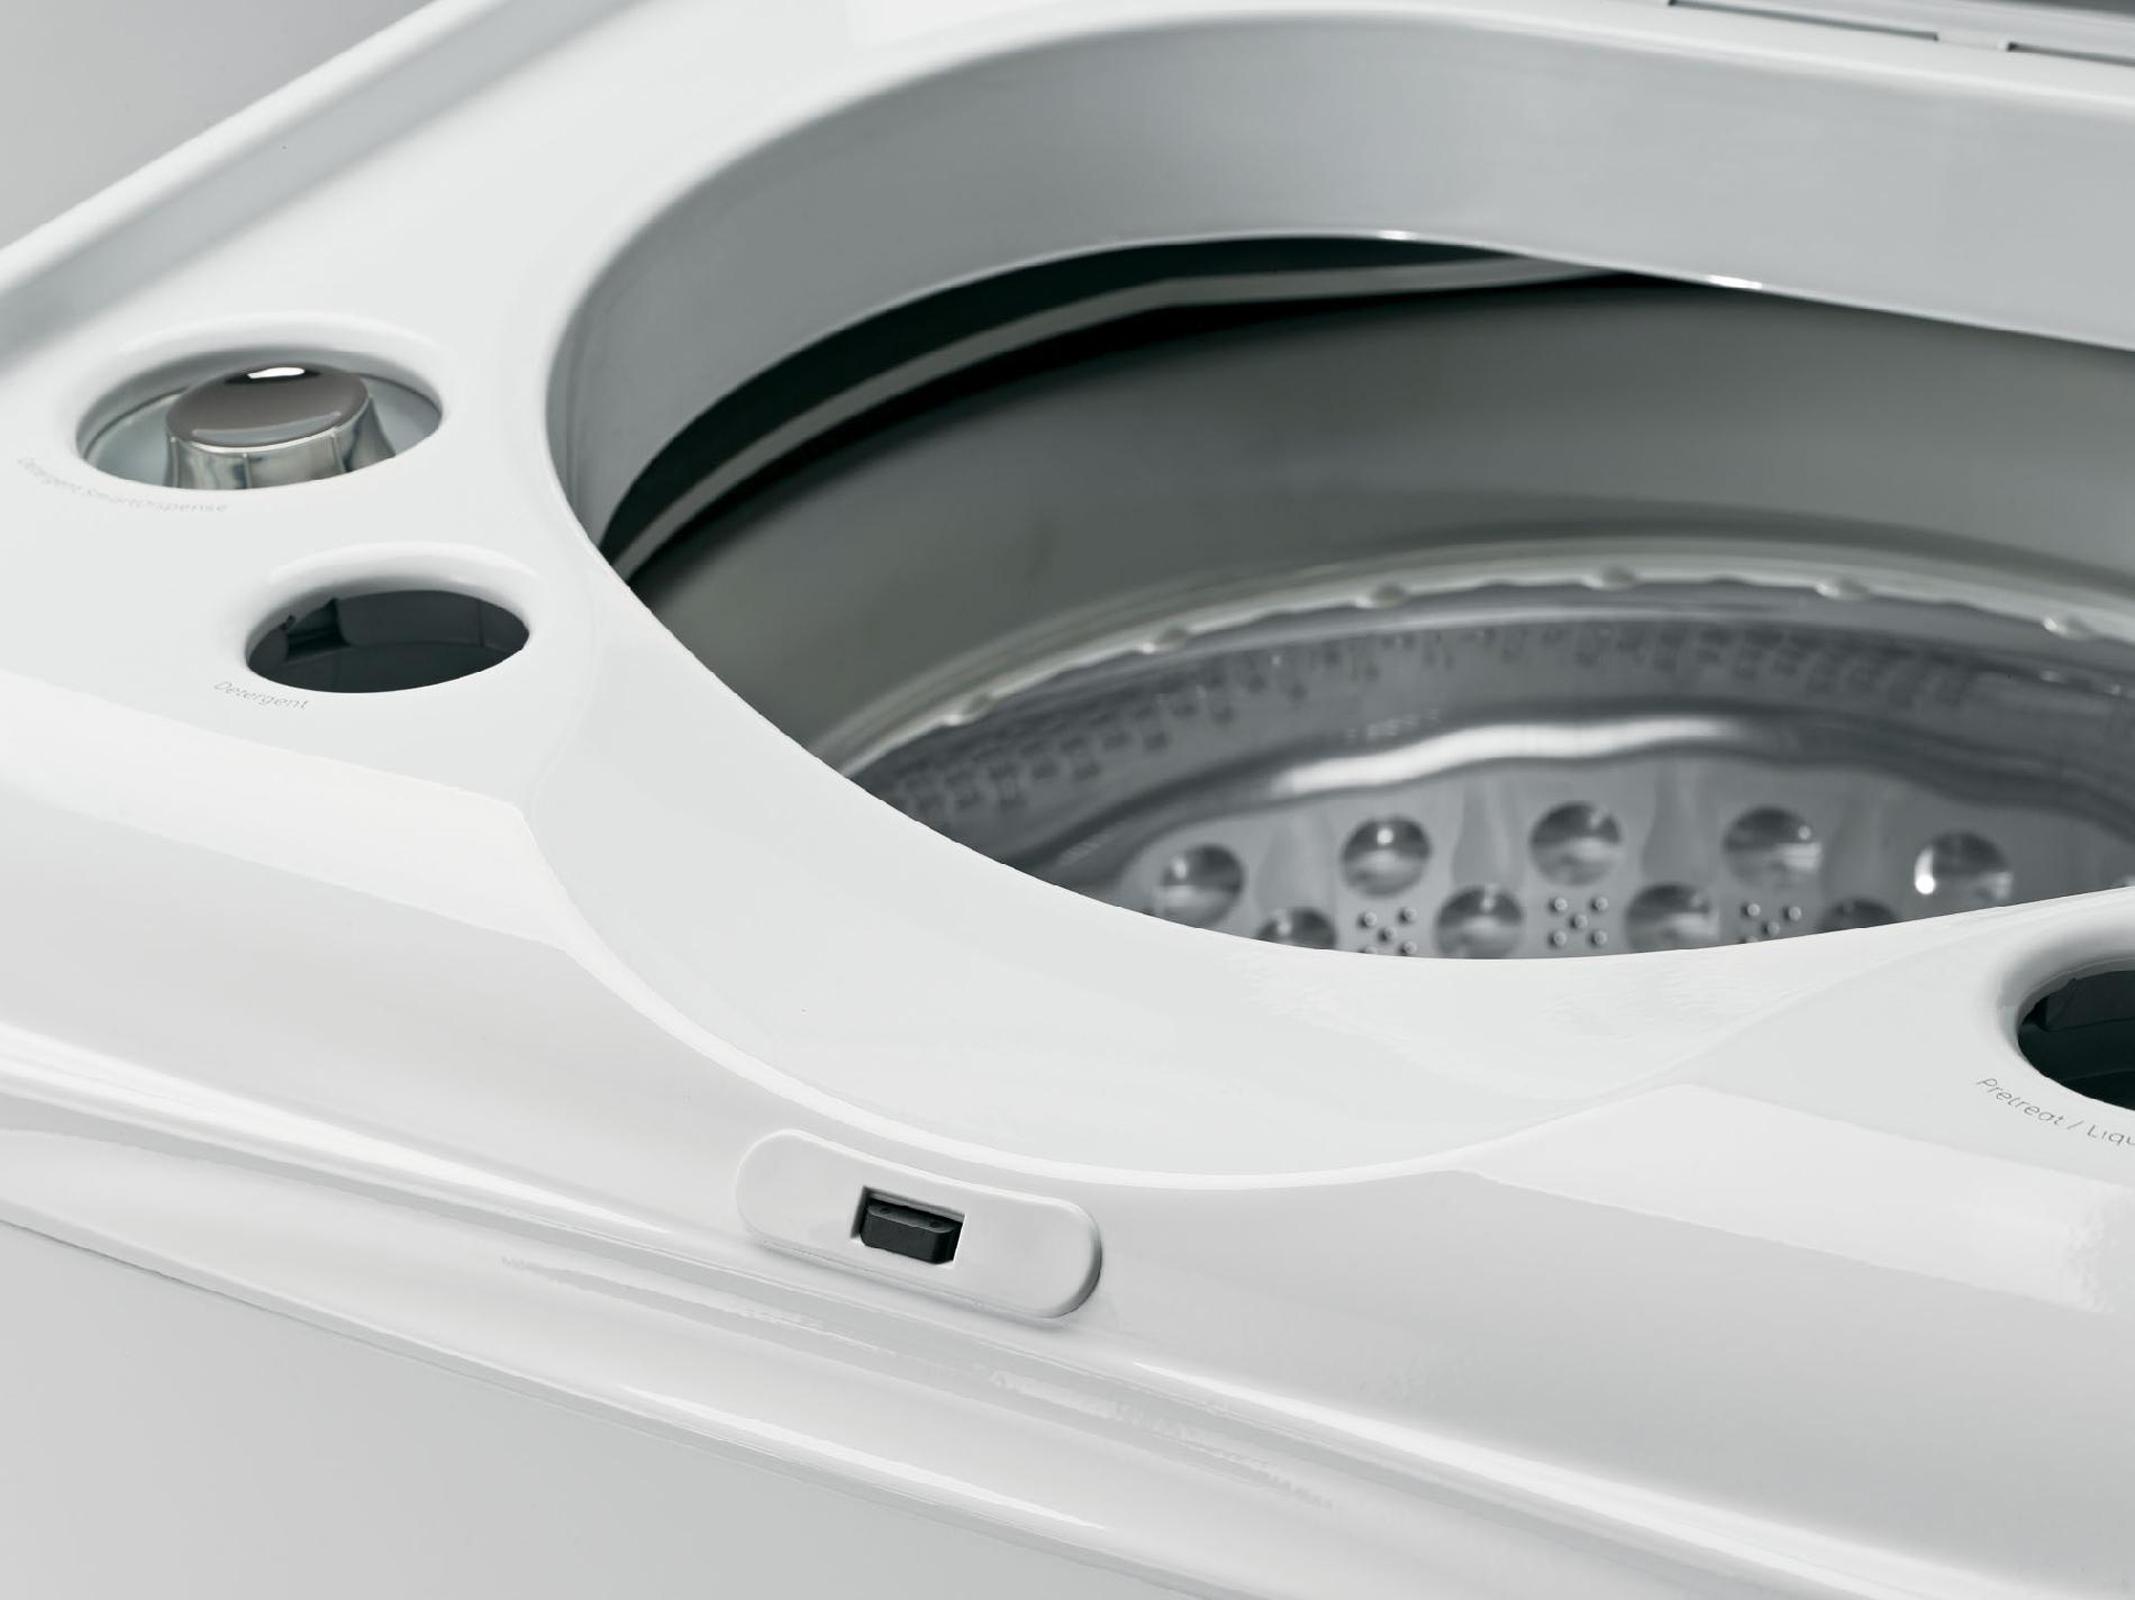 GE GTWS8655DMC 5.0 cu. ft. Top-Load Washer - Metallic Carbon